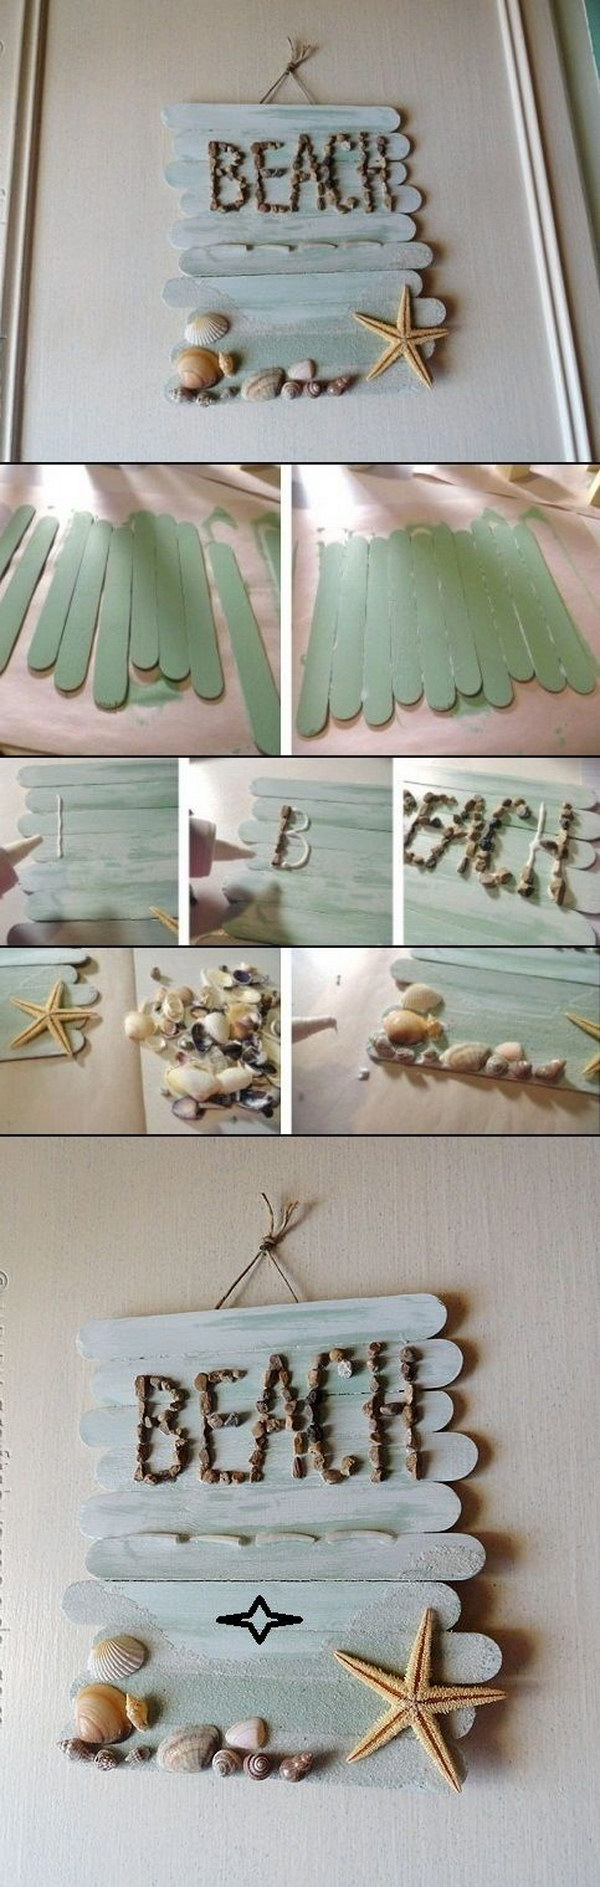 DIY Craft Stick Wall Art